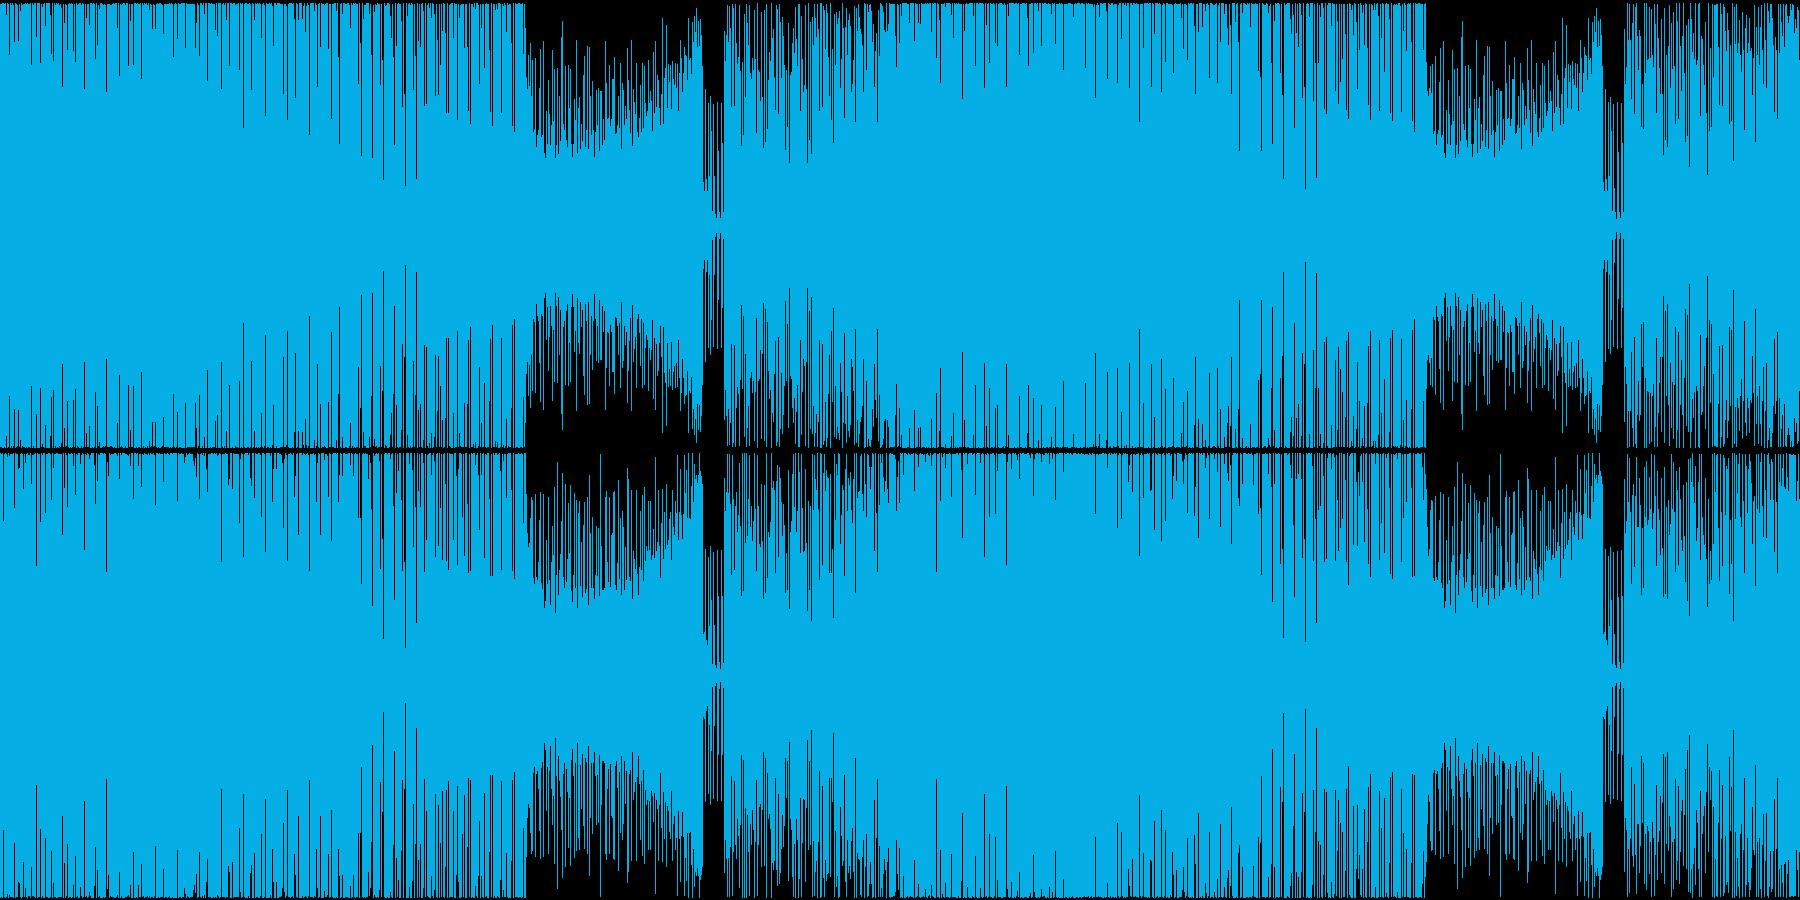 EDM トロピカル チャート メジャーLの再生済みの波形